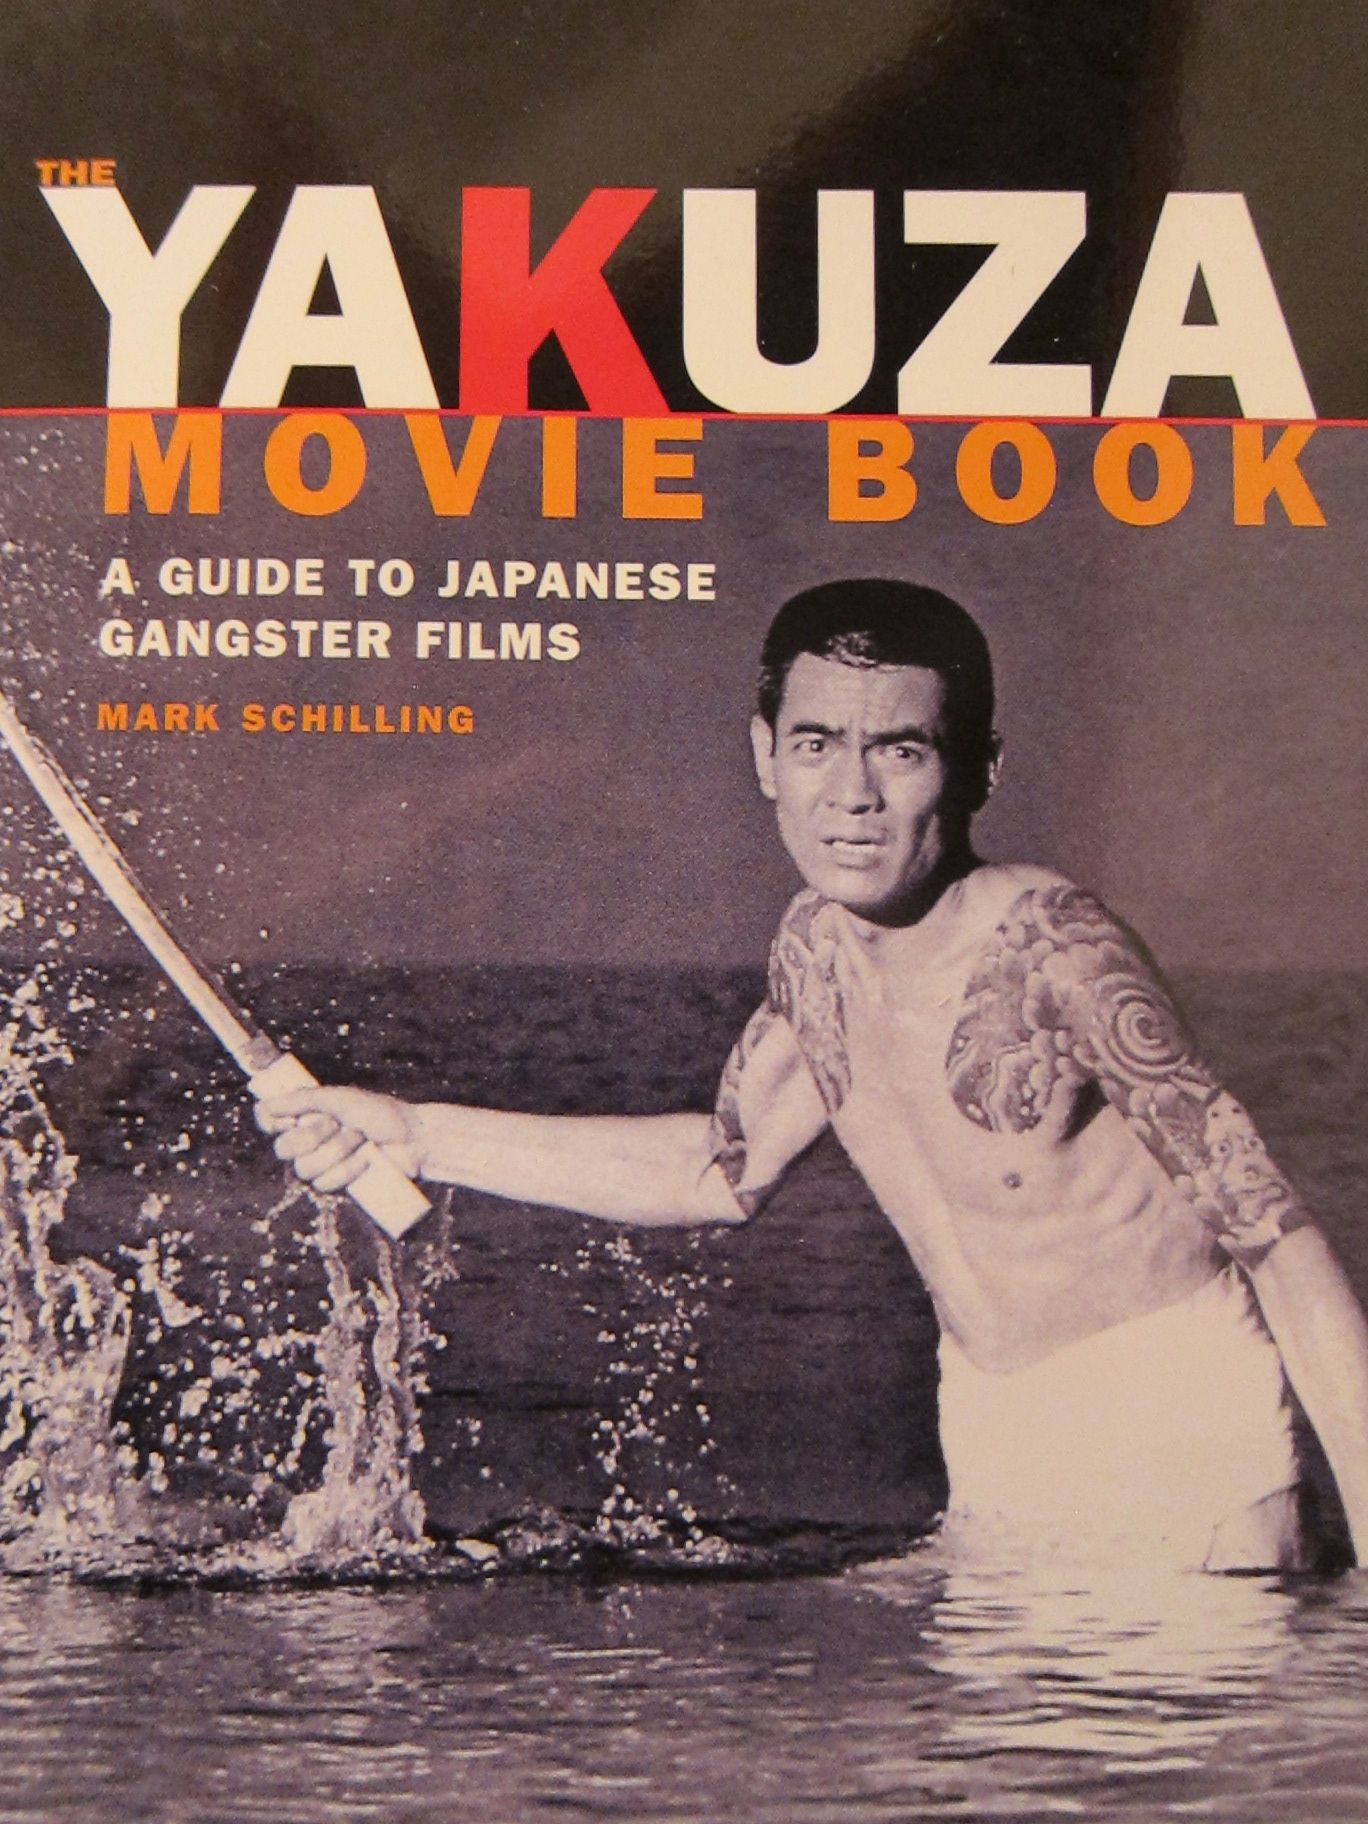 Japanese Yakuza Japanese Yakuza Movies 2010